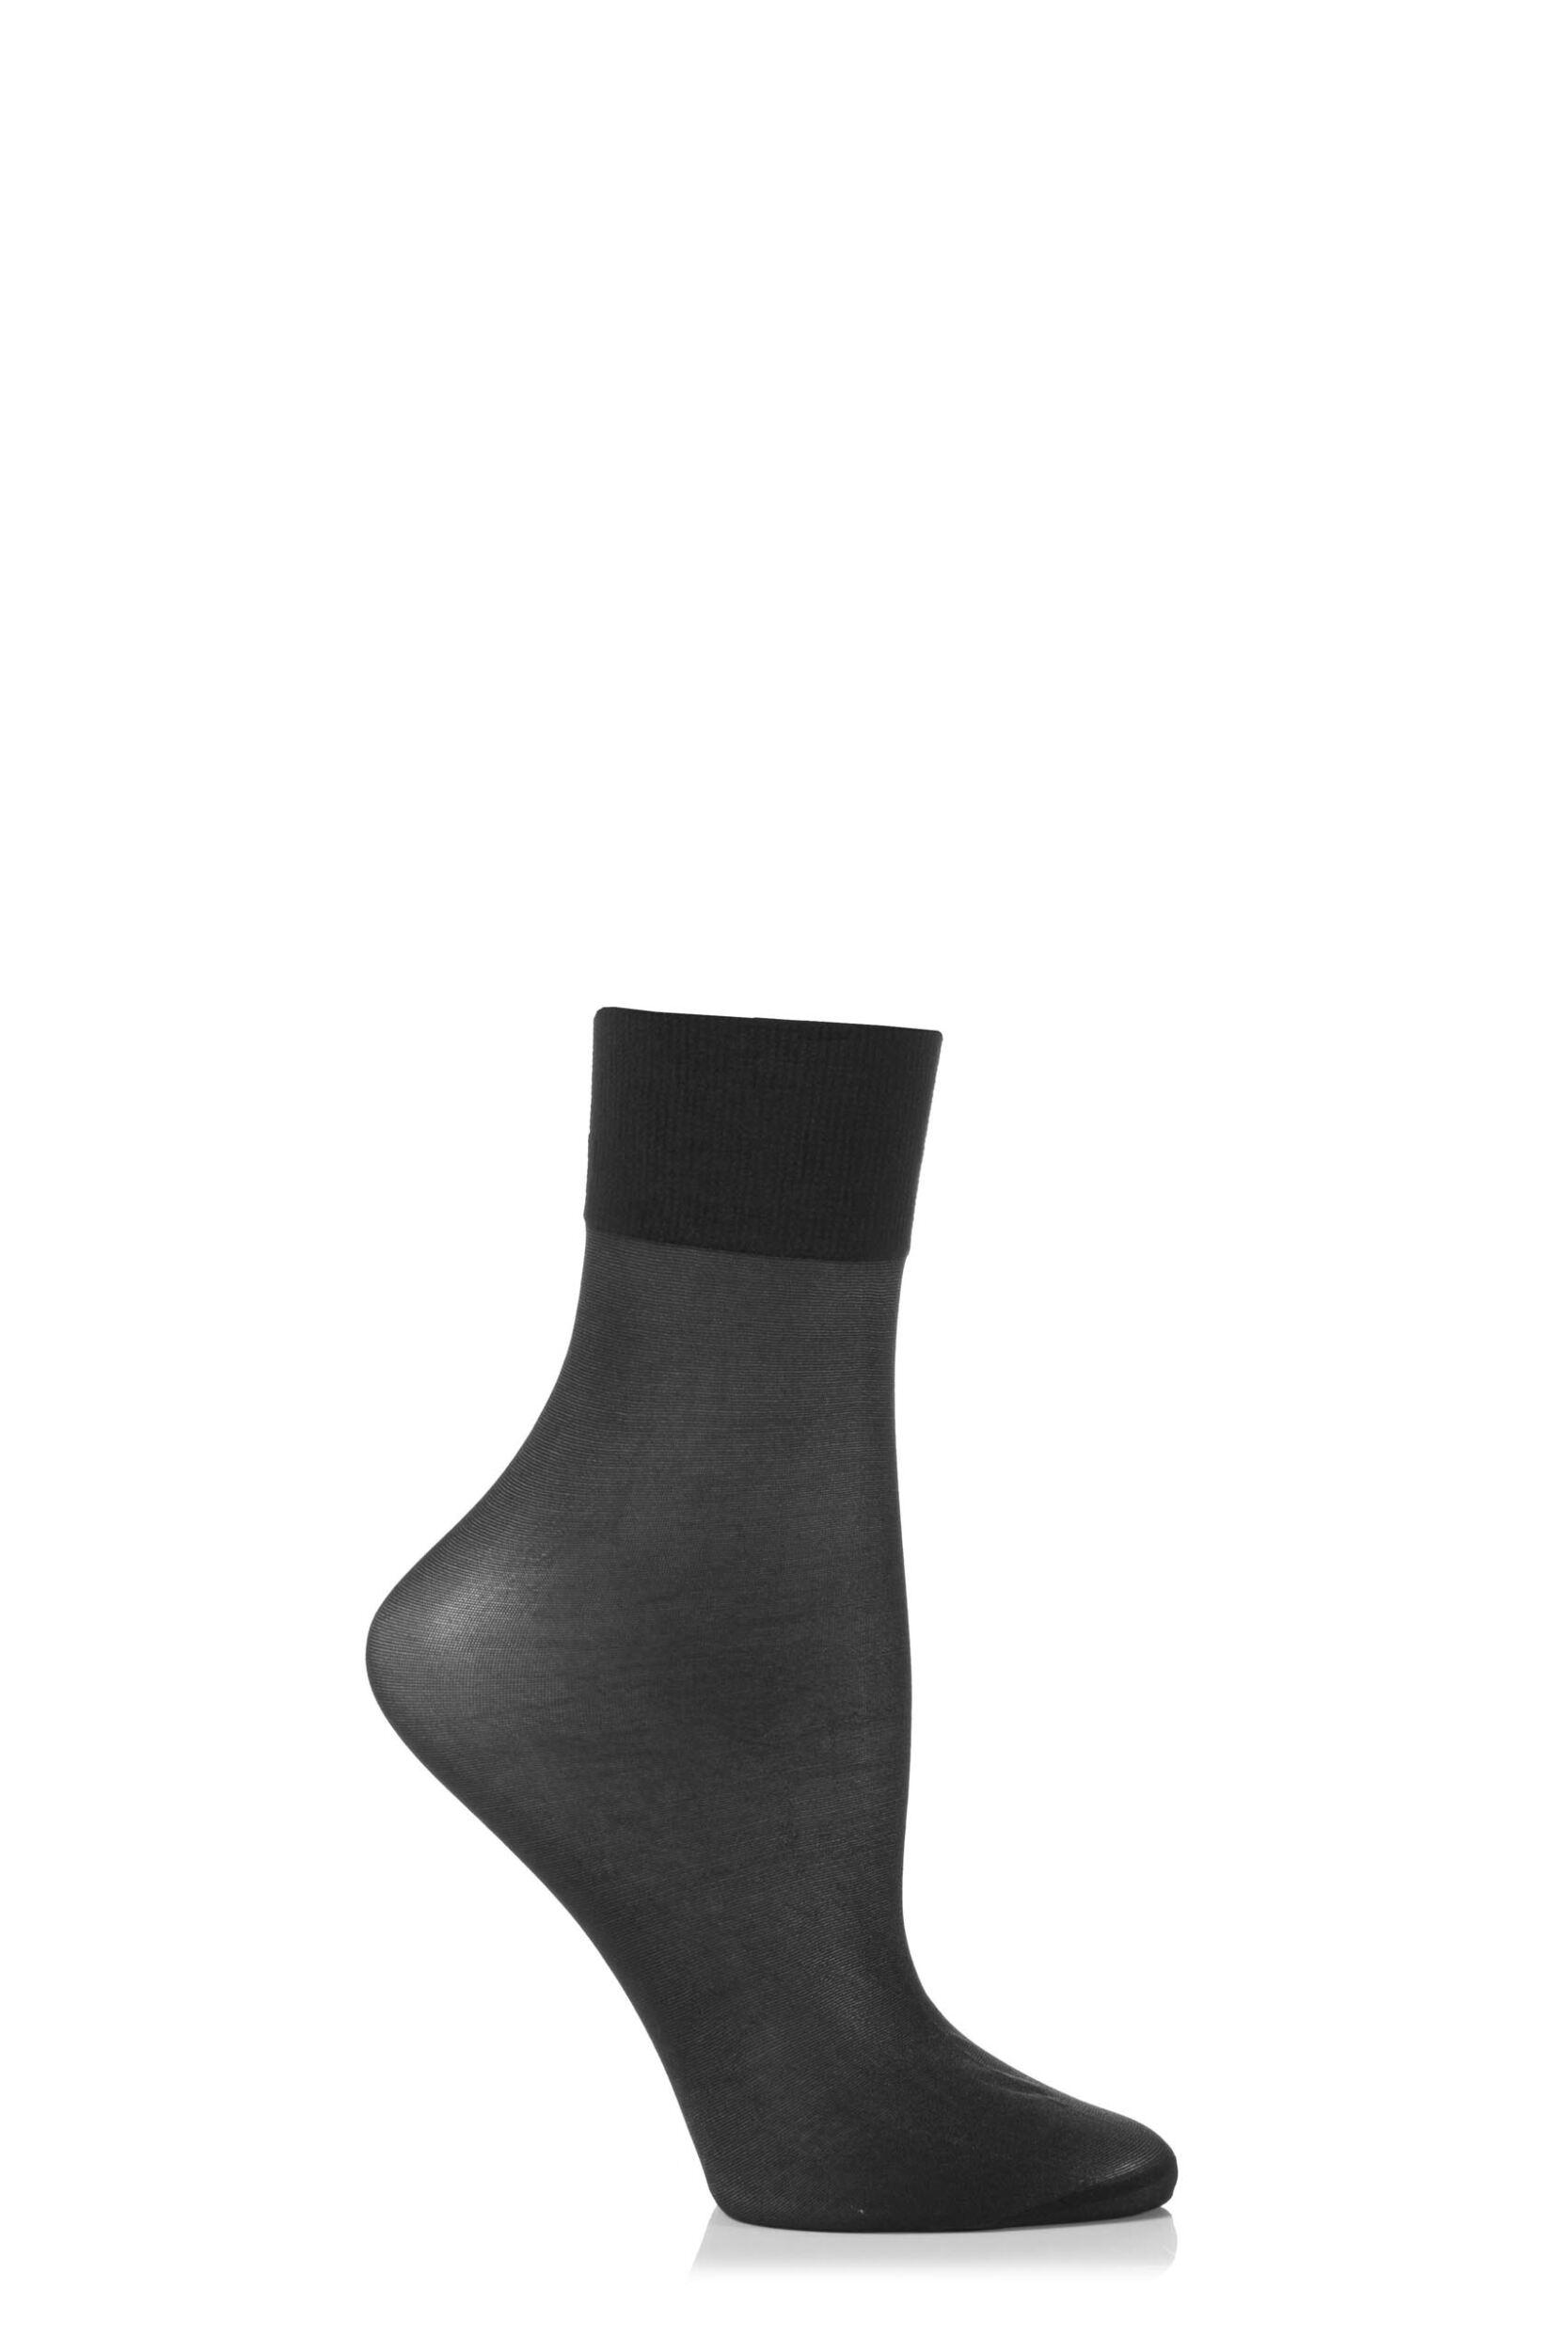 Ladies 1 Pair Falke Seidenglatt 15 Denier Transparent Shining Ankle Highs With Sensitive Top